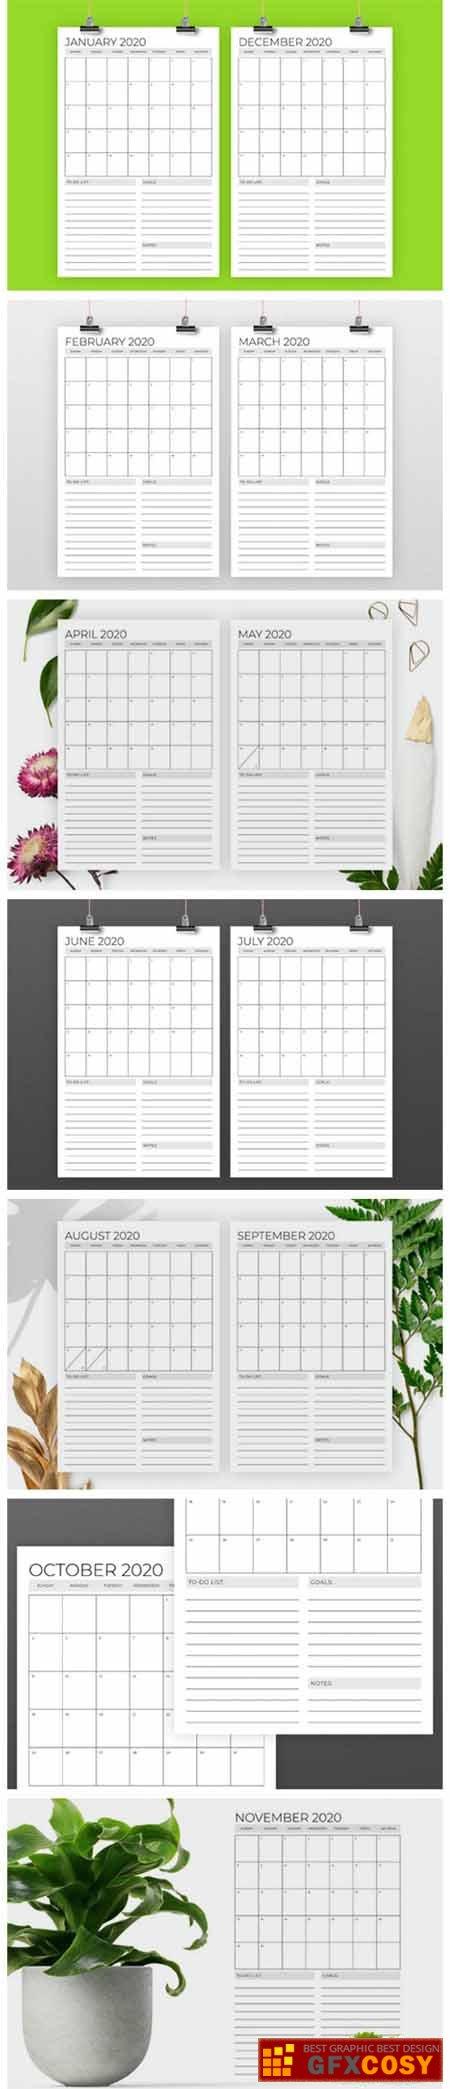 Vertical 11X17 Inch 2020 Calendar 1916124 » Free Download